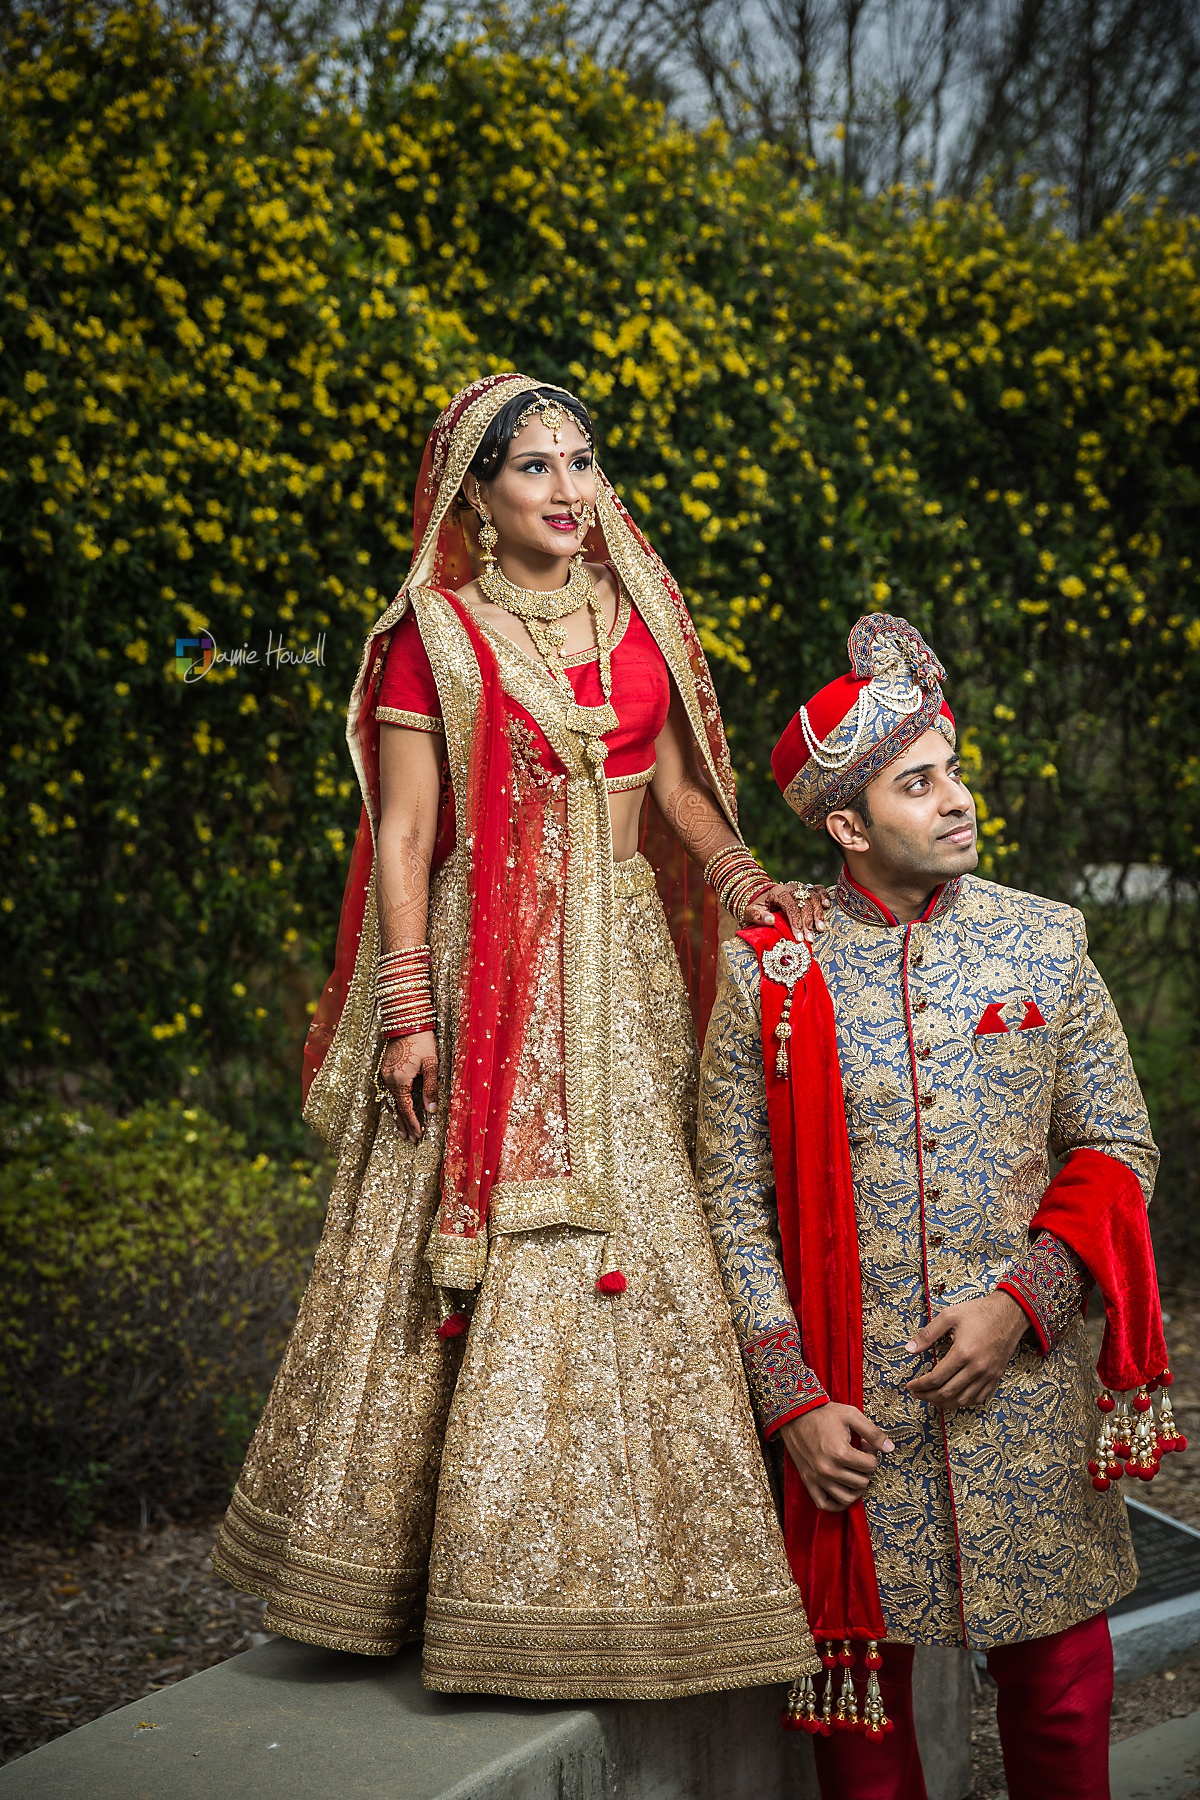 Florence SC Indian wedding ceremony (7)